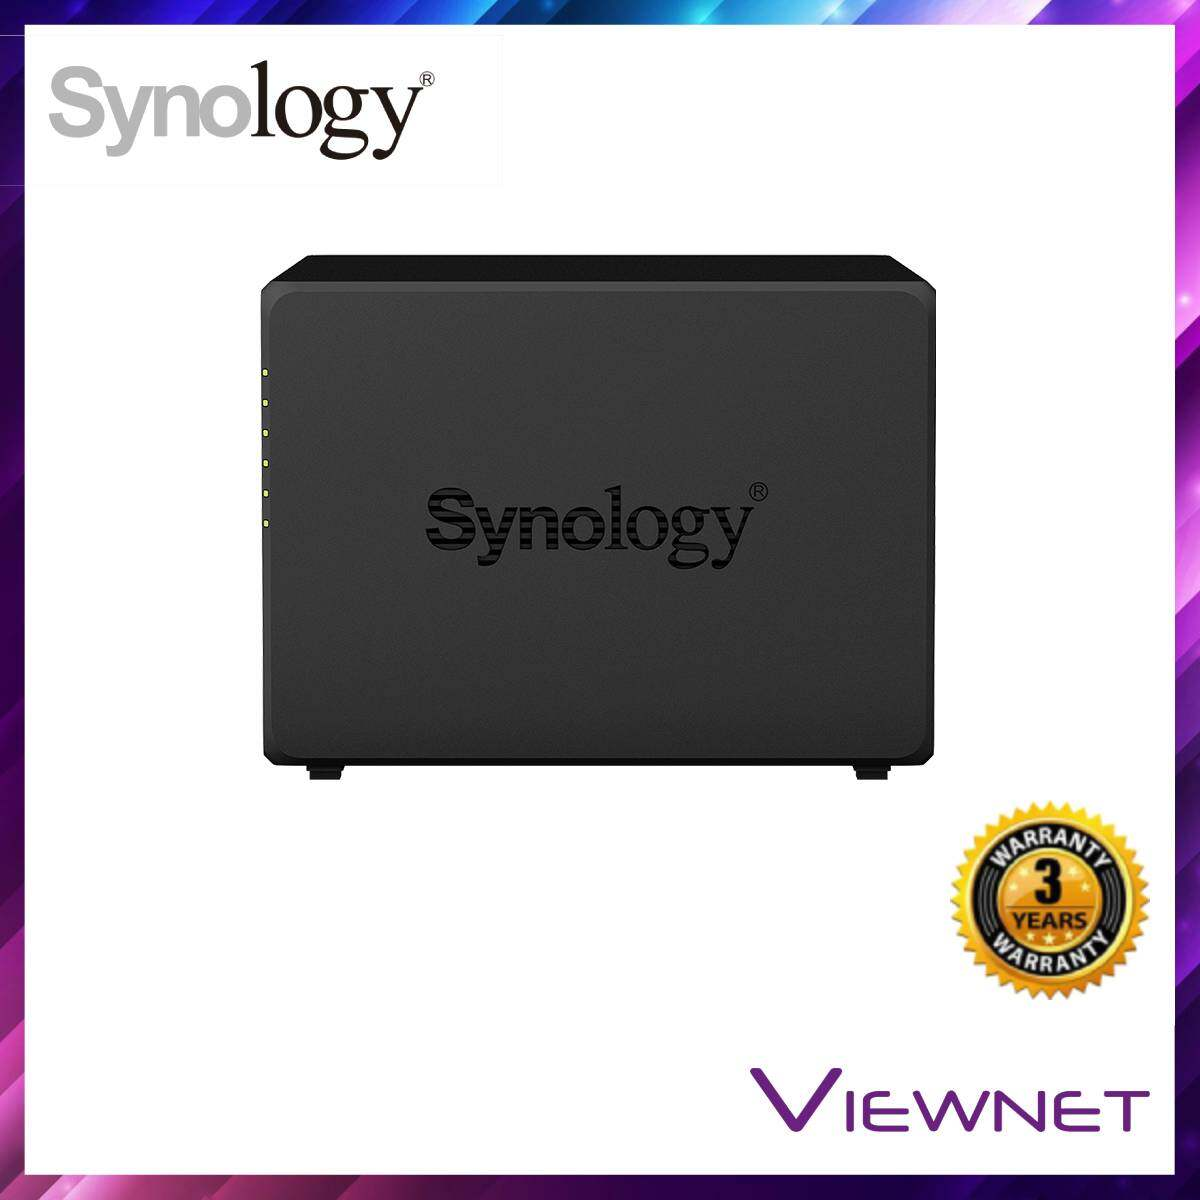 Synology Enclosure 5-BAYS/Intel Celeron J3455 QC 1.5GHz/8GB (DS1019+) NAS